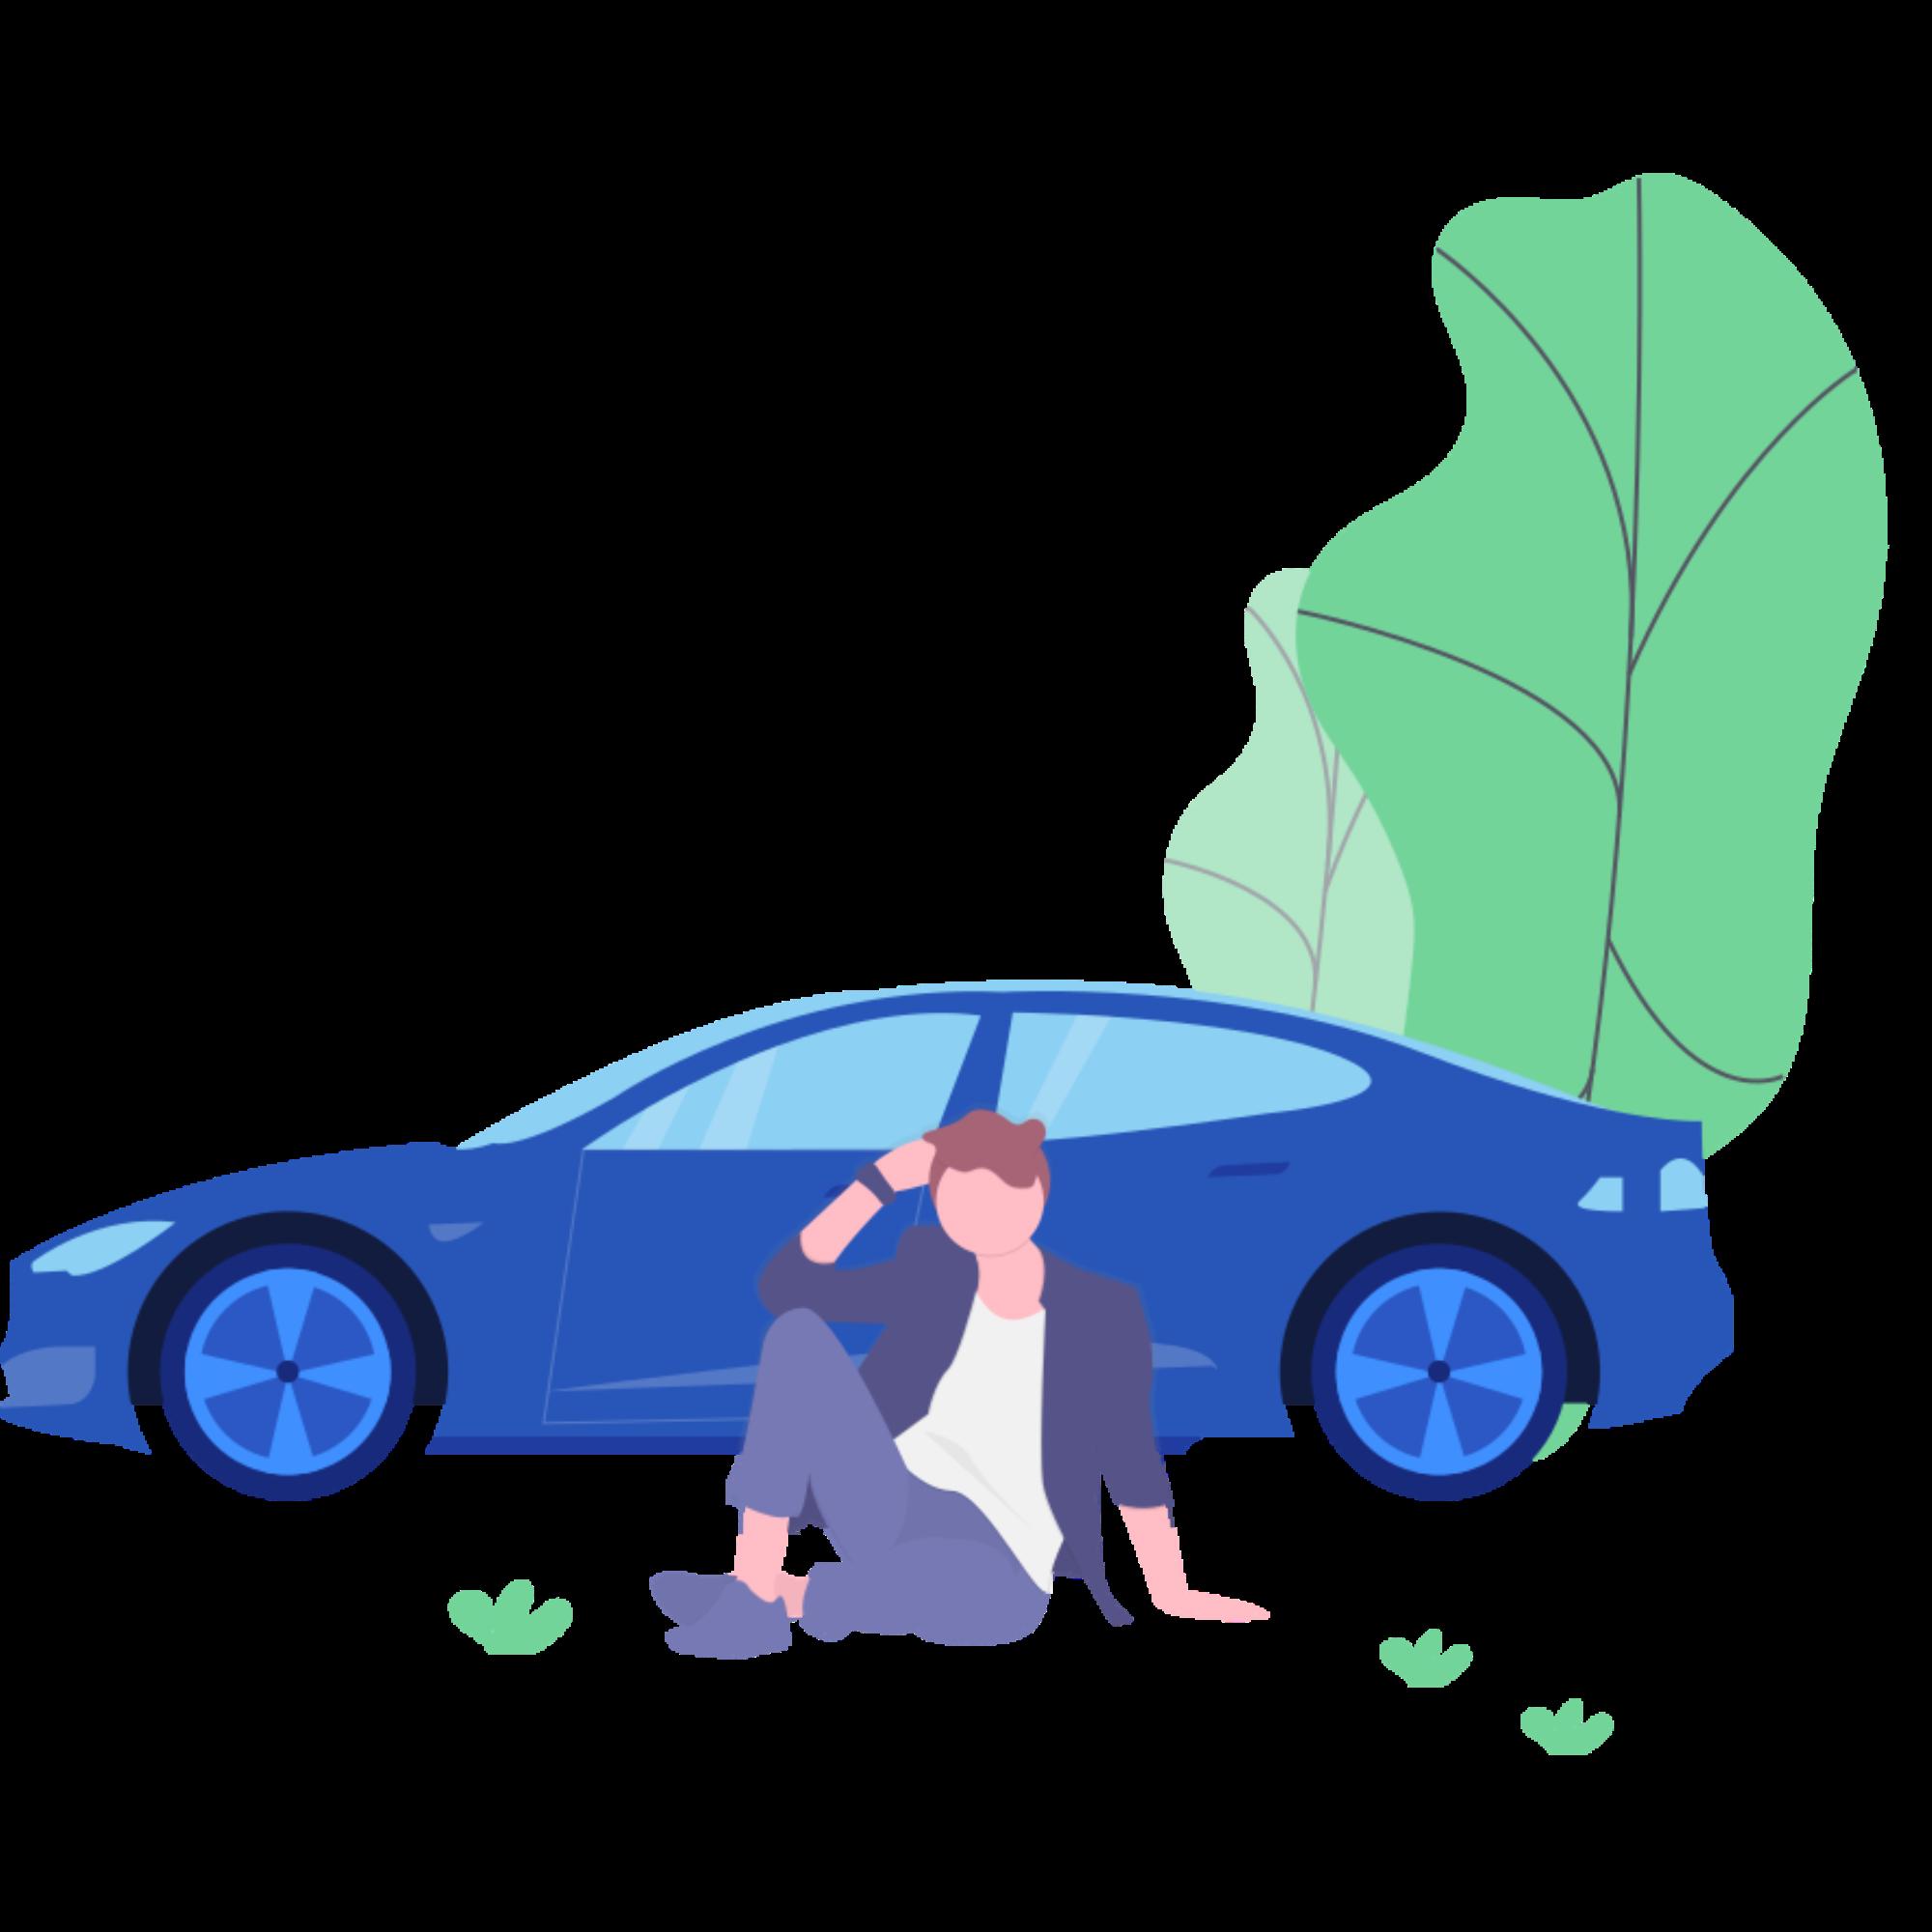 Autopflege Grünwald Illustration